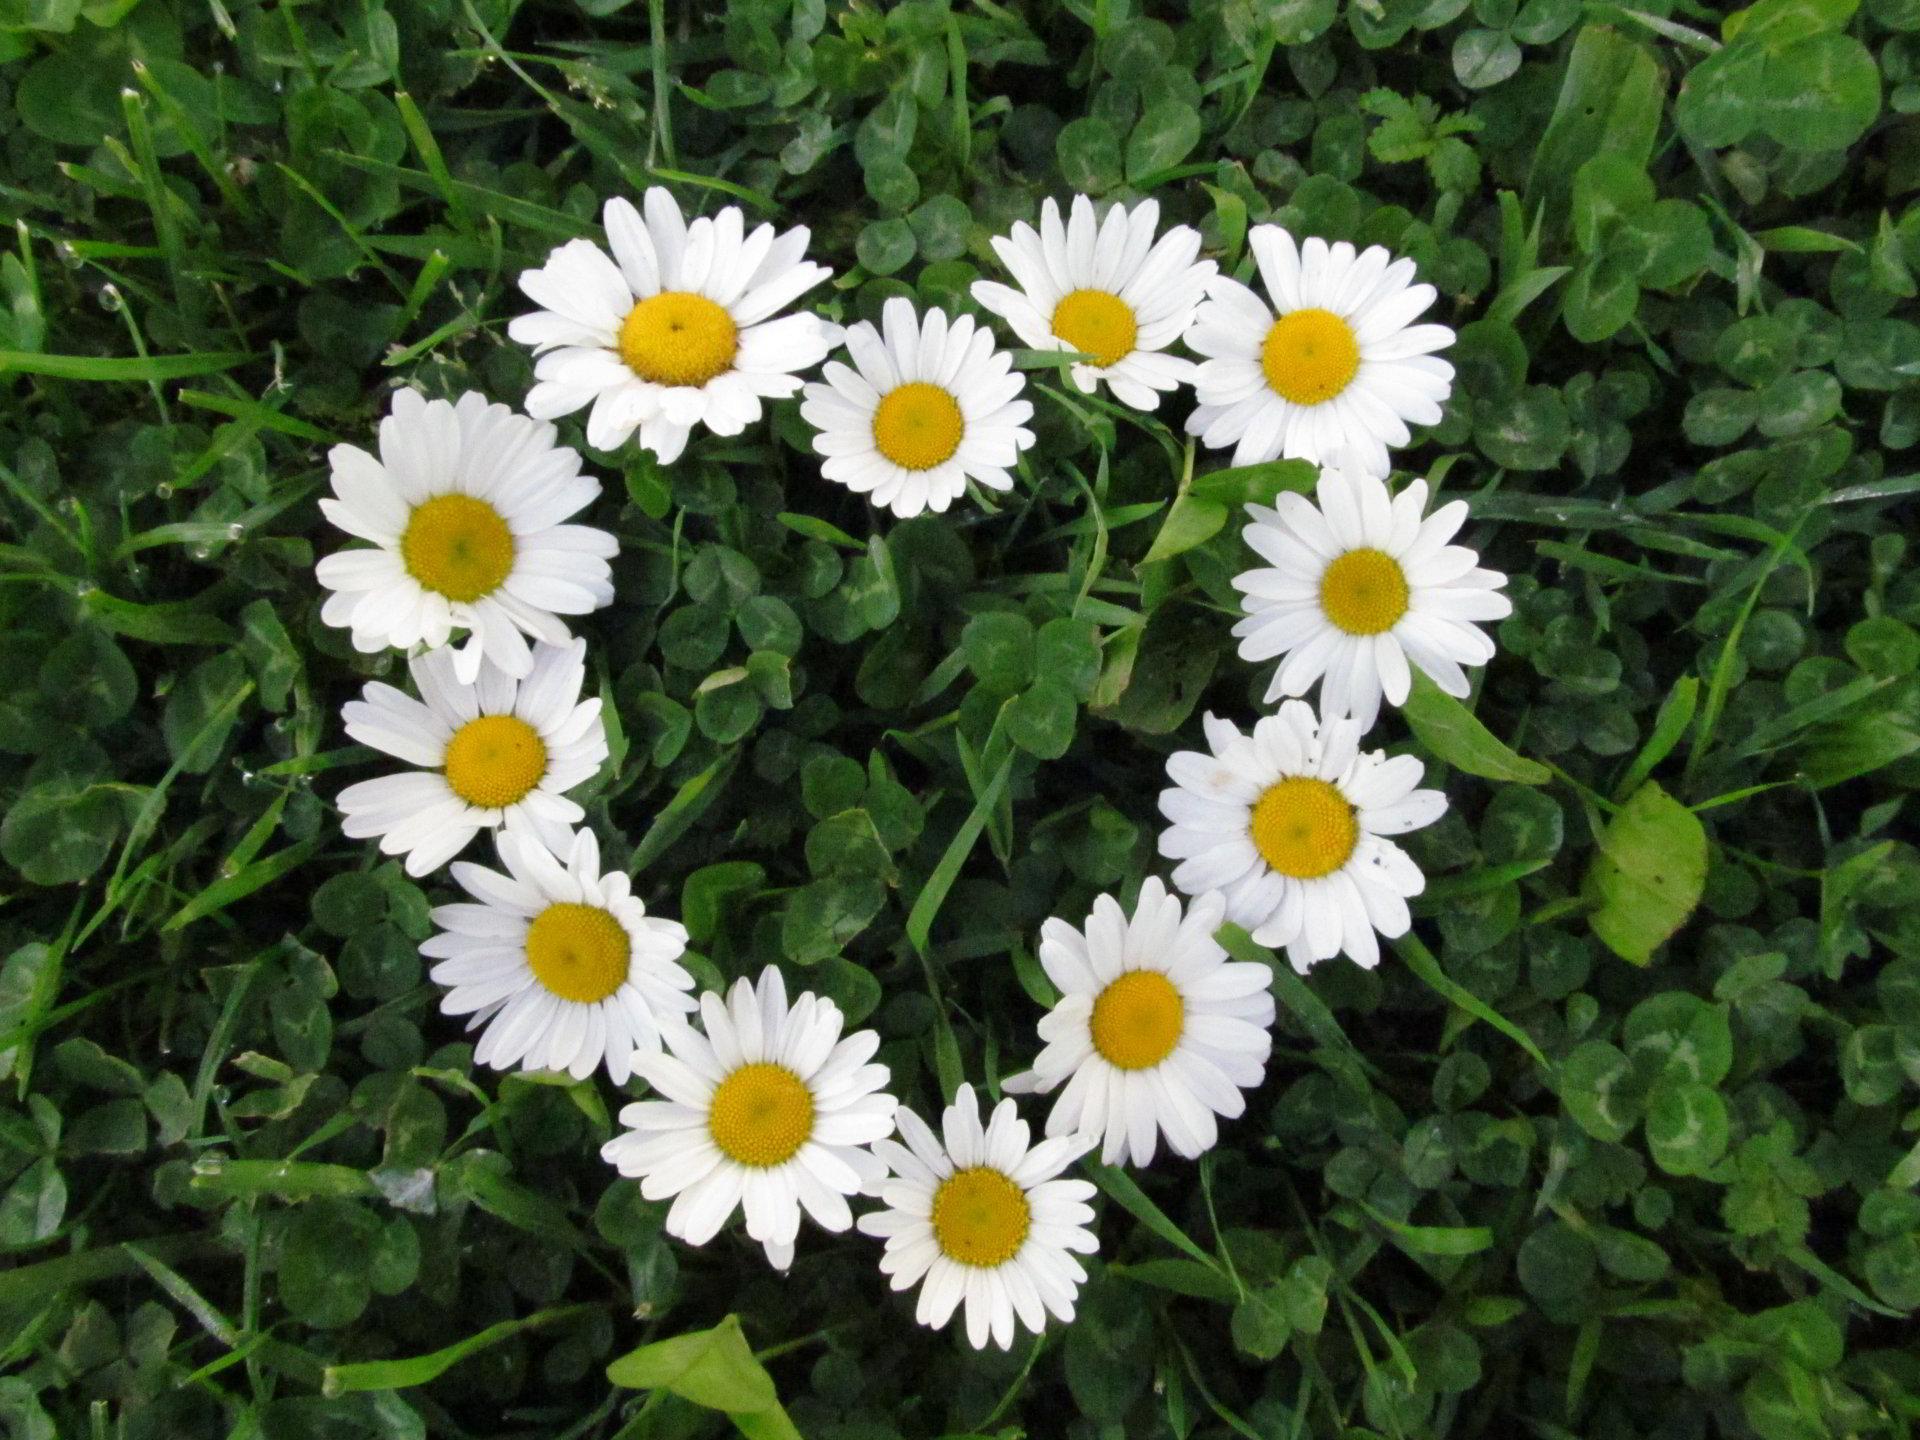 hinh anh hoa cuc dep 34